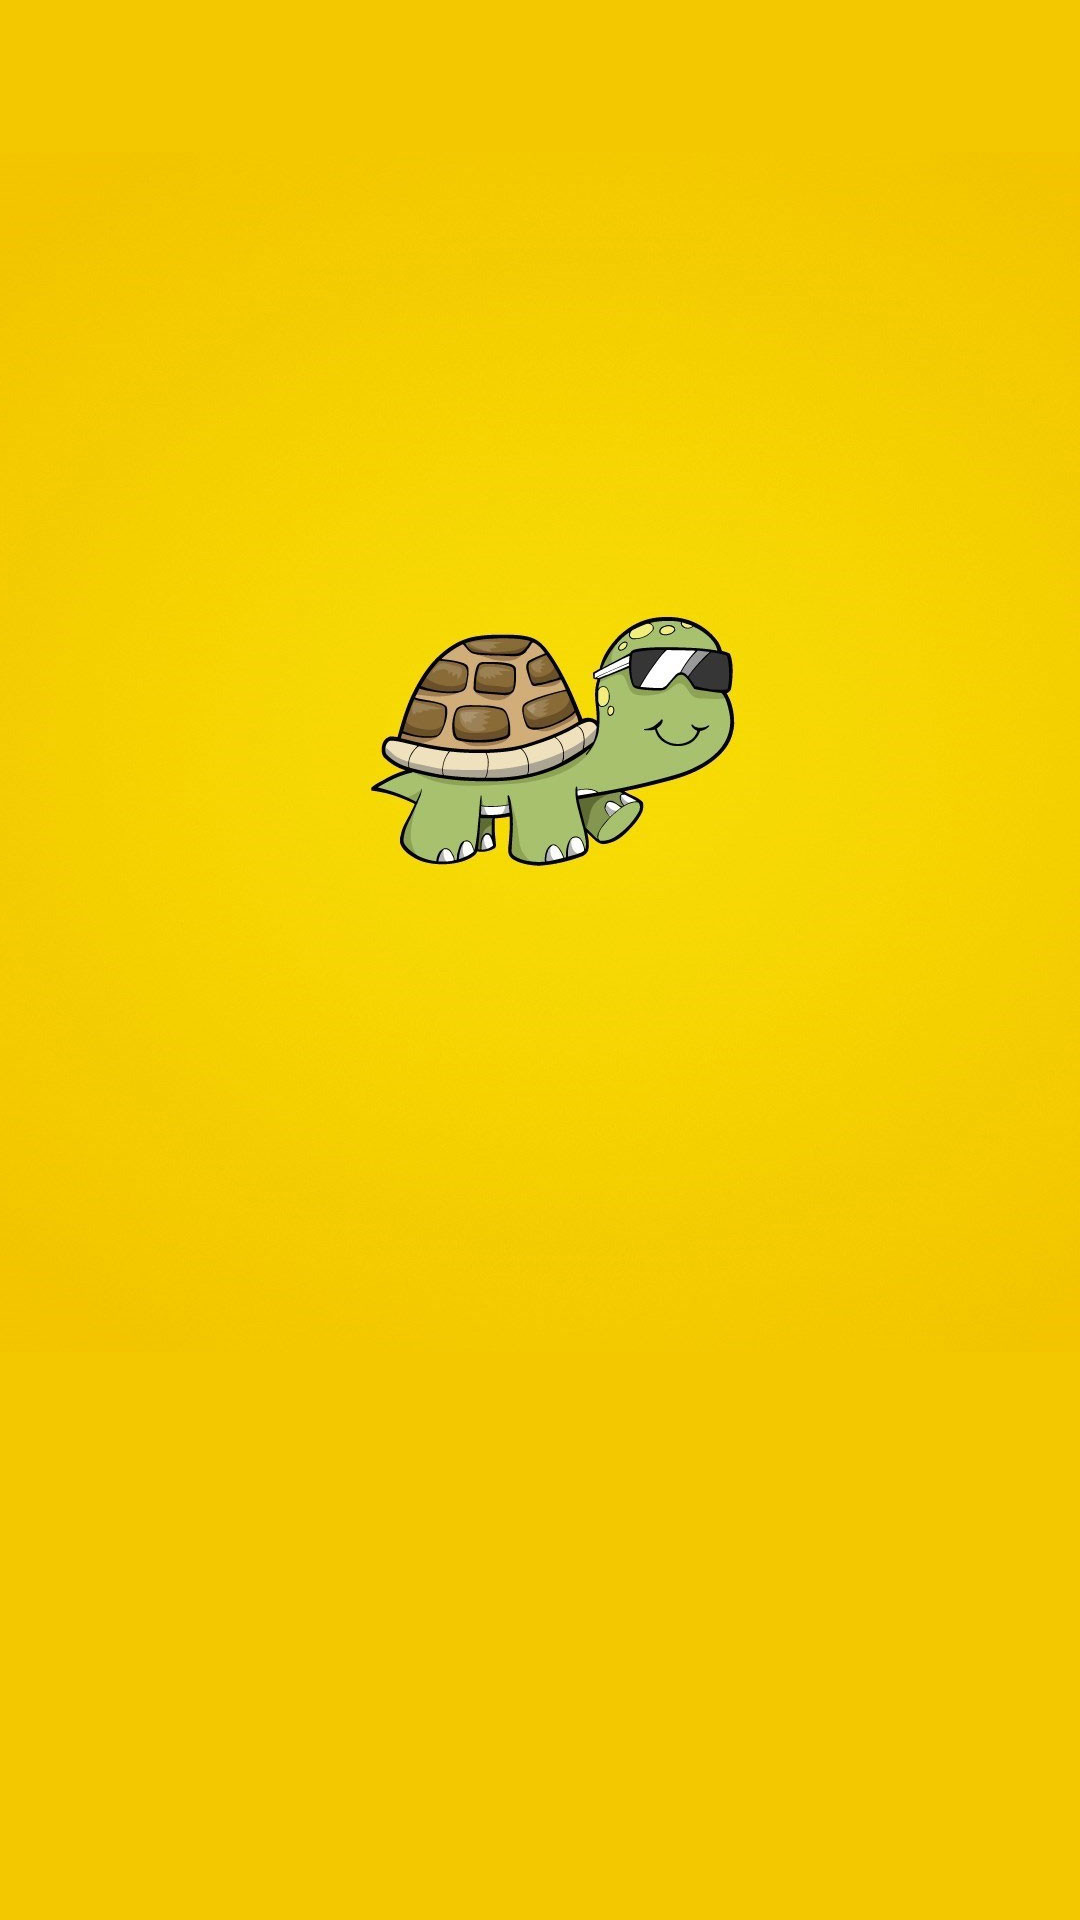 Cute Iphone 6 Plus Wallpaper Tumblr Archidev